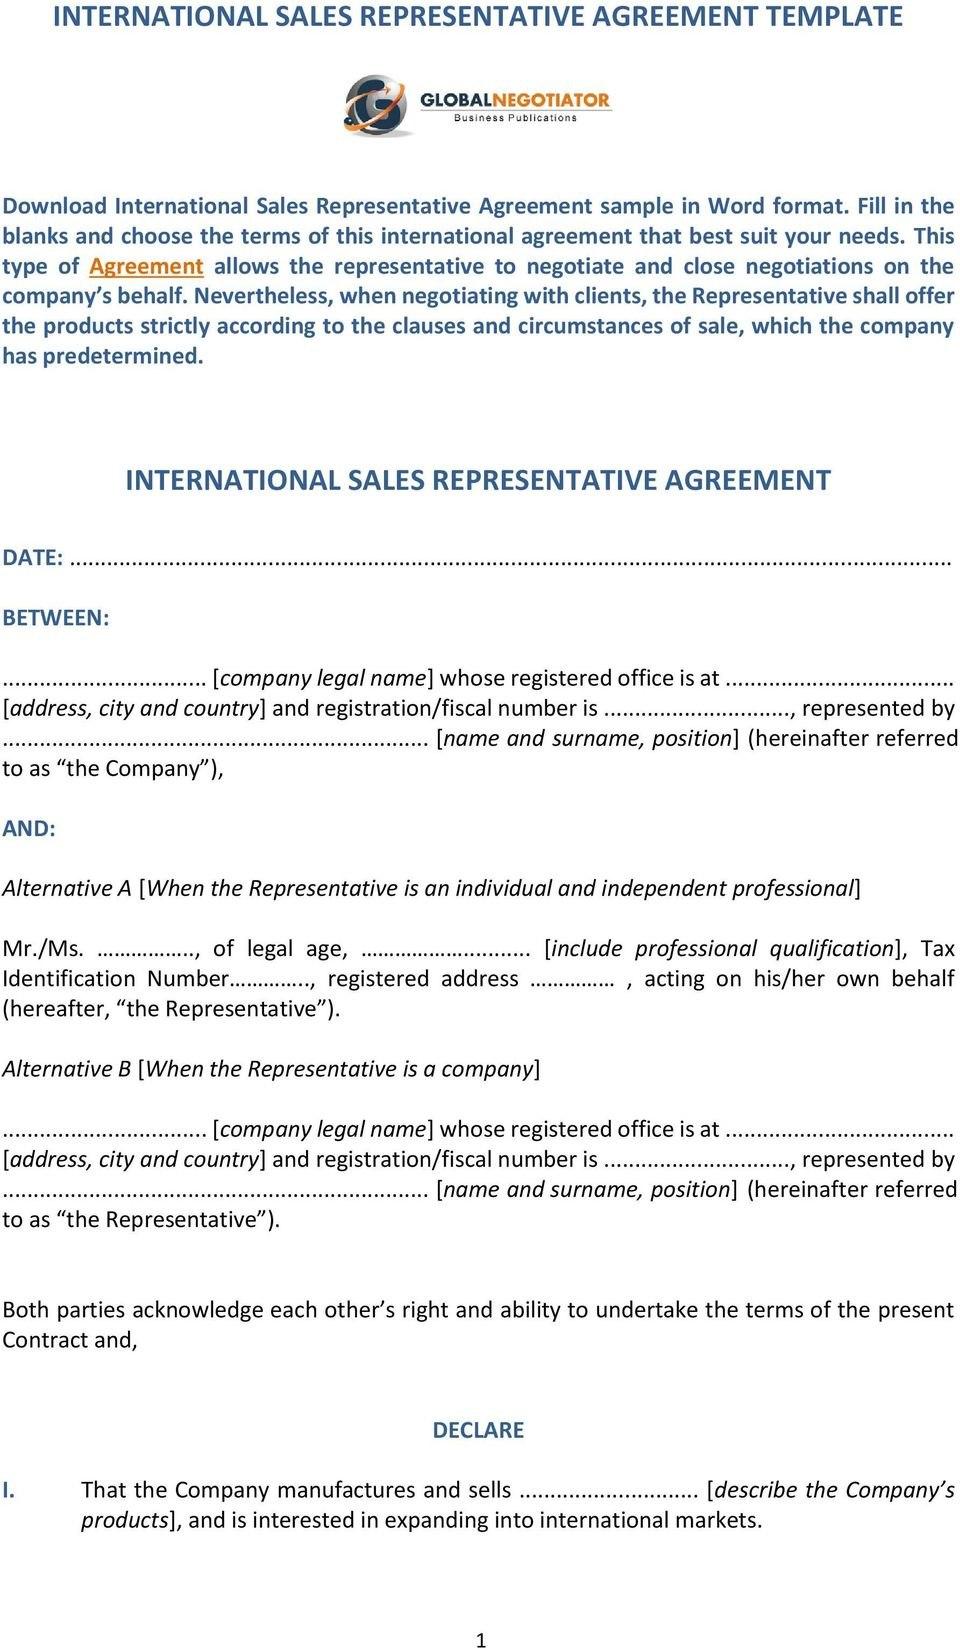 International Sales Representative Agreement Template International For Legal Representation Agreement Template